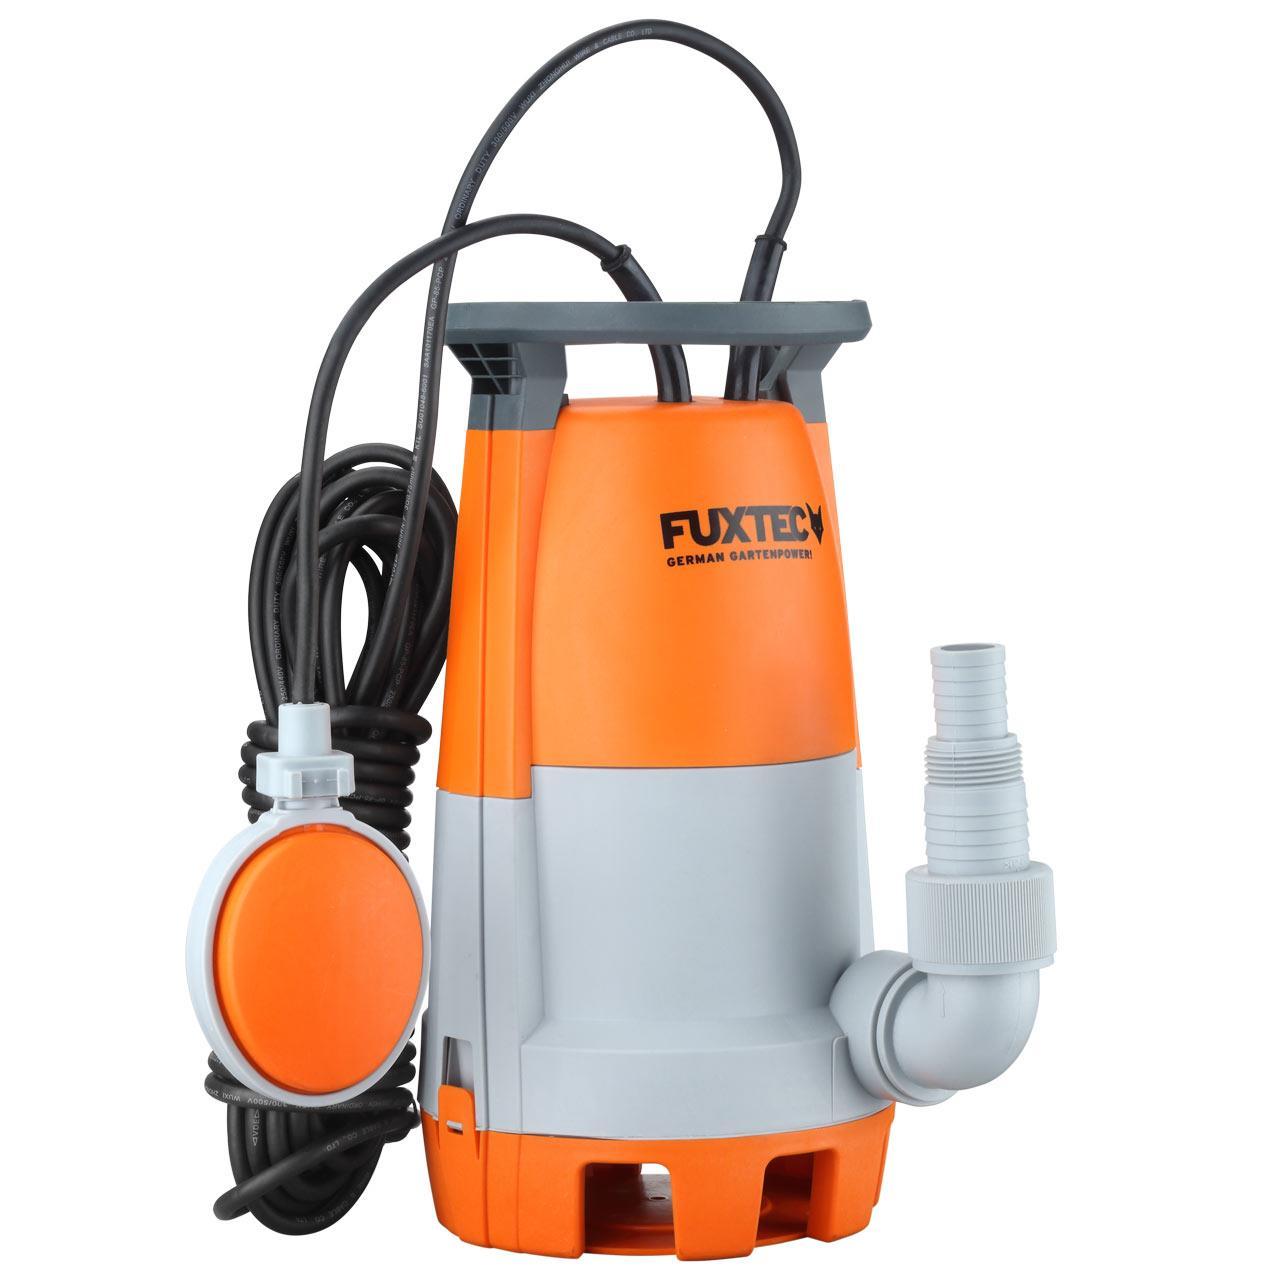 Pumpe FX-TP1350 von Fuxtec